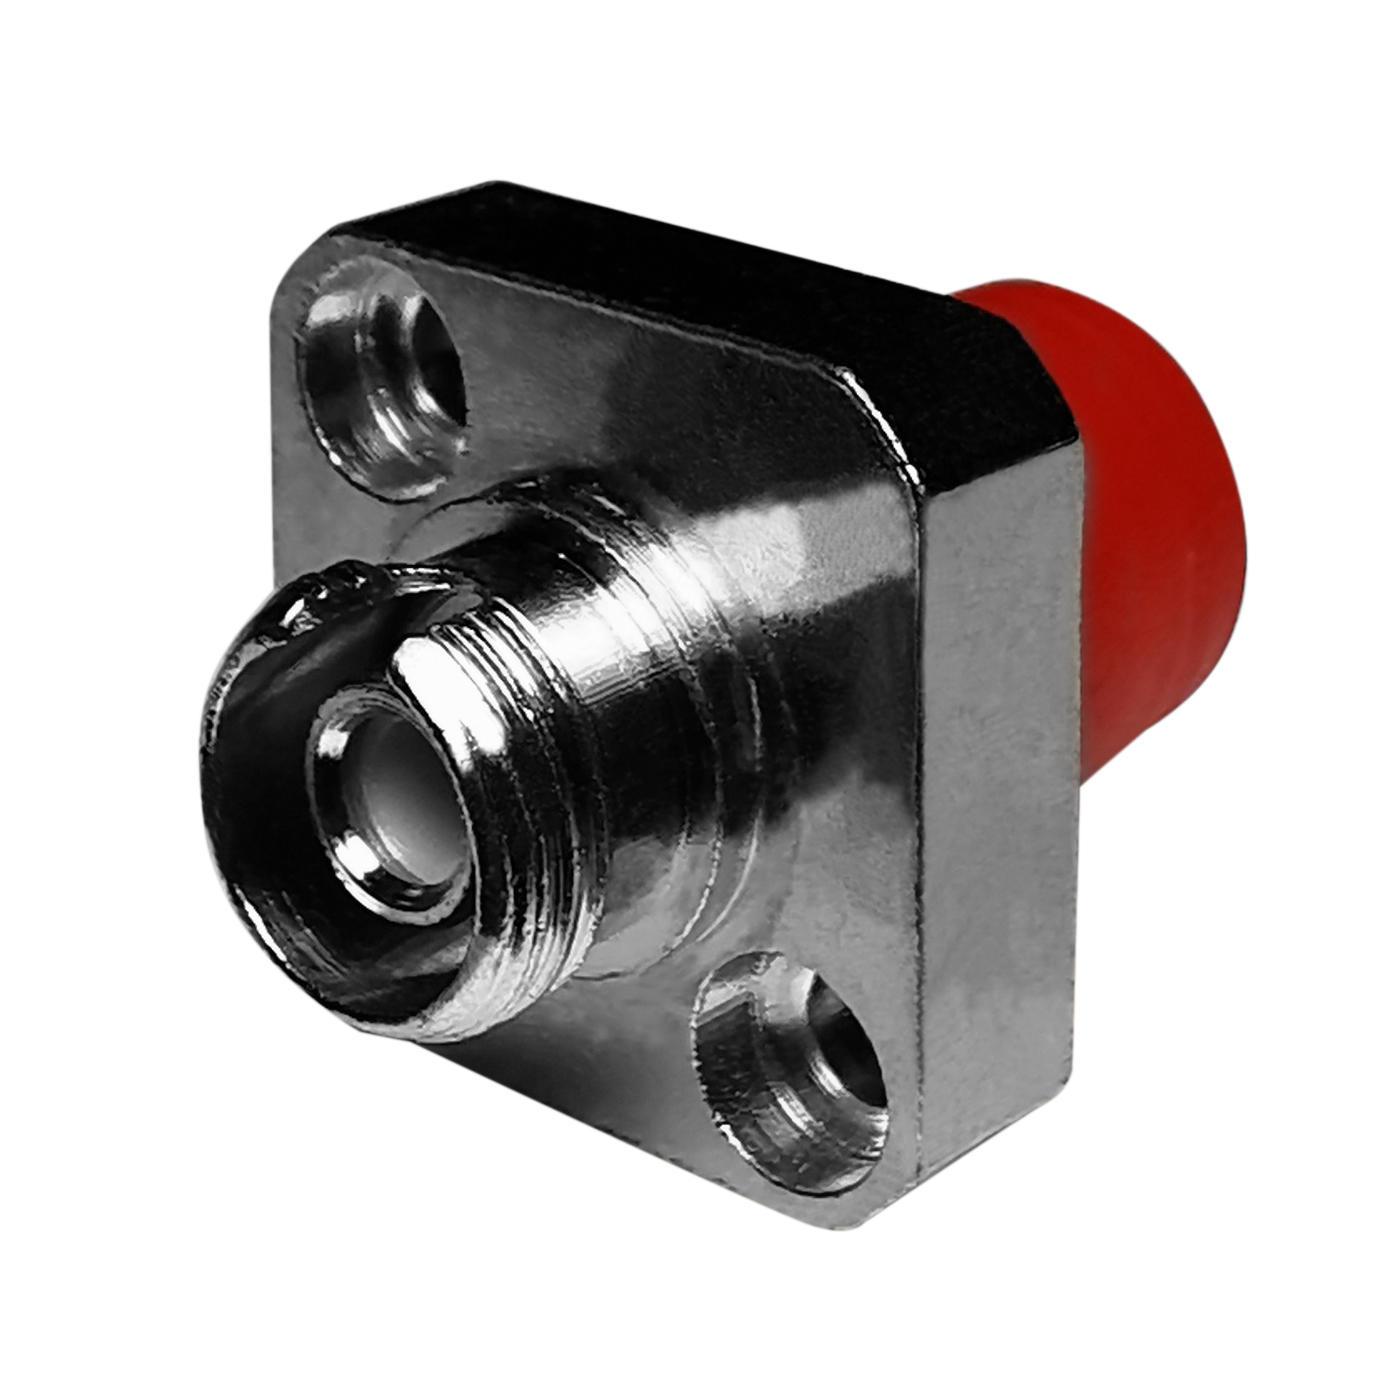 Fiber Optic Adapter FC d-Type Adaptor